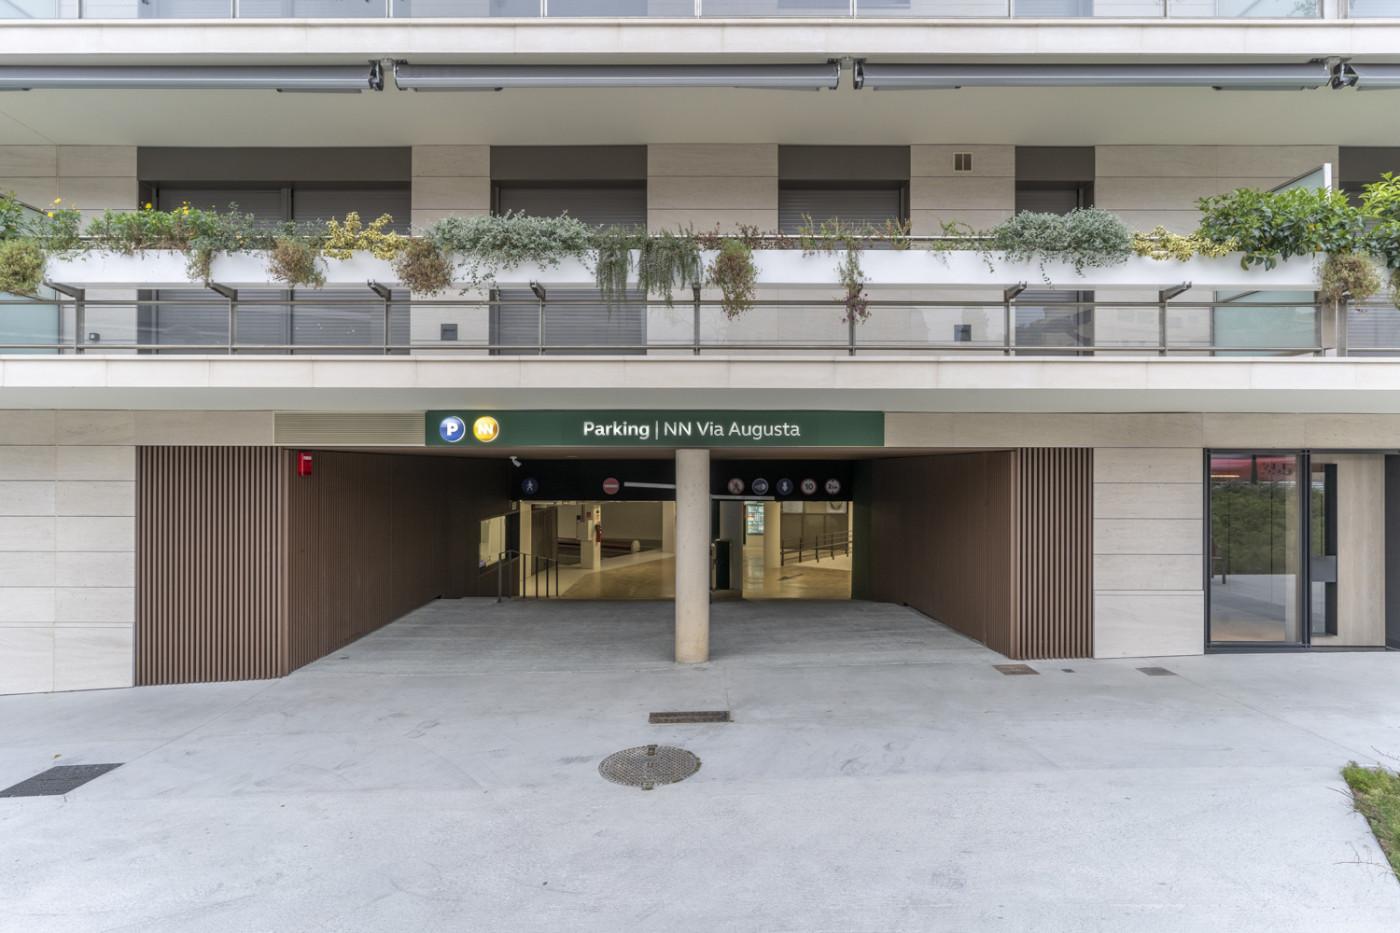 Alquiler Almacén  Barcelona ,sarrià